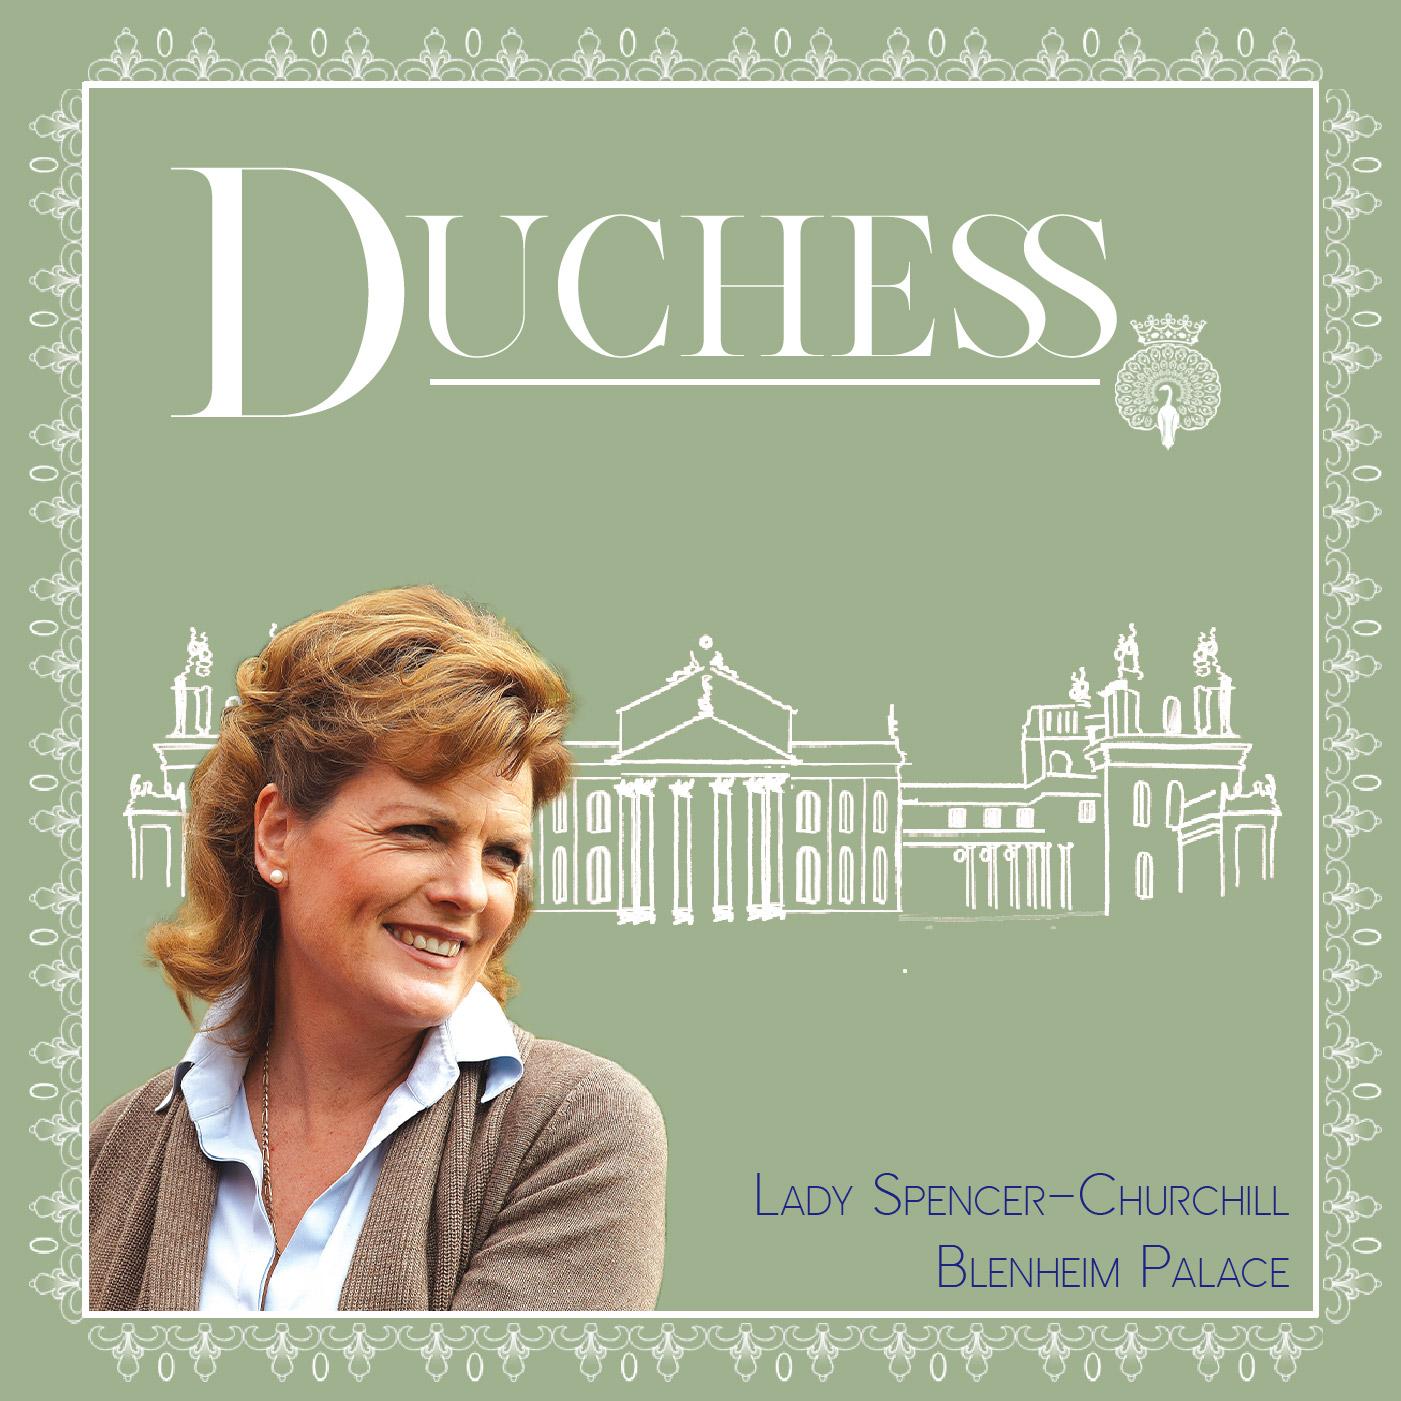 Lady Henrietta Spencer-Churchill of Blenheim Palace